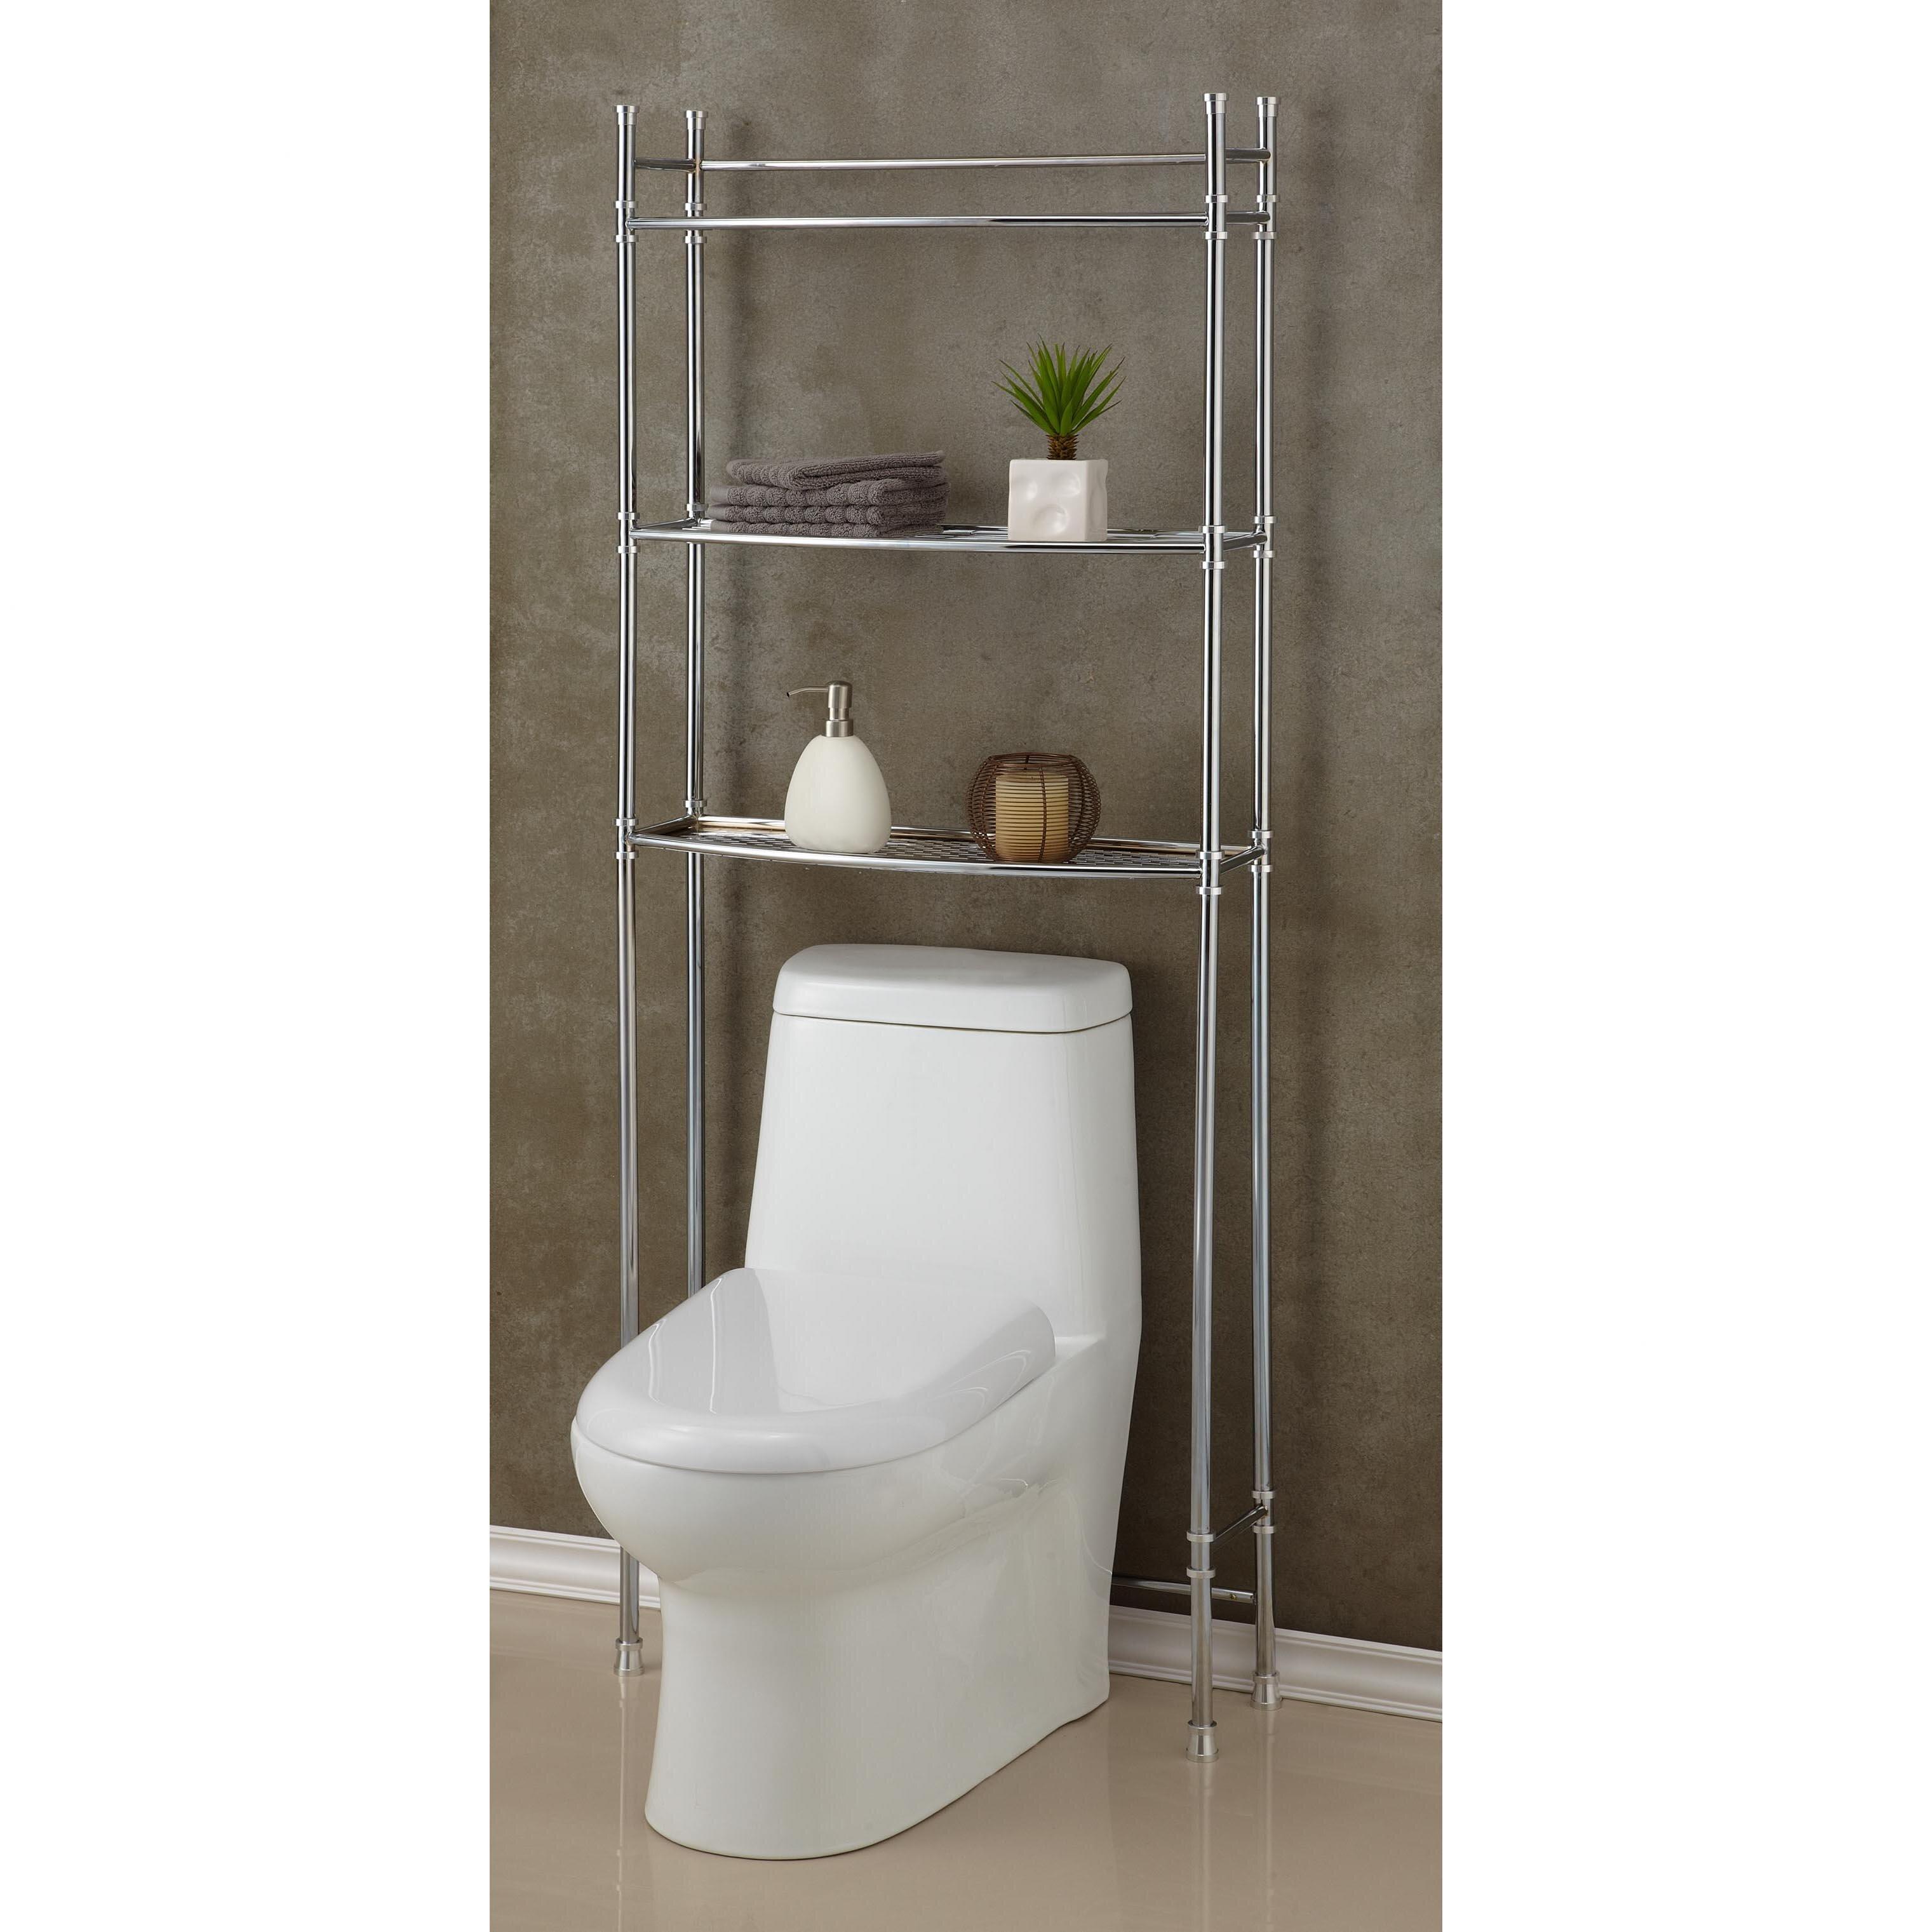 toilets trading companies - alibaba.com